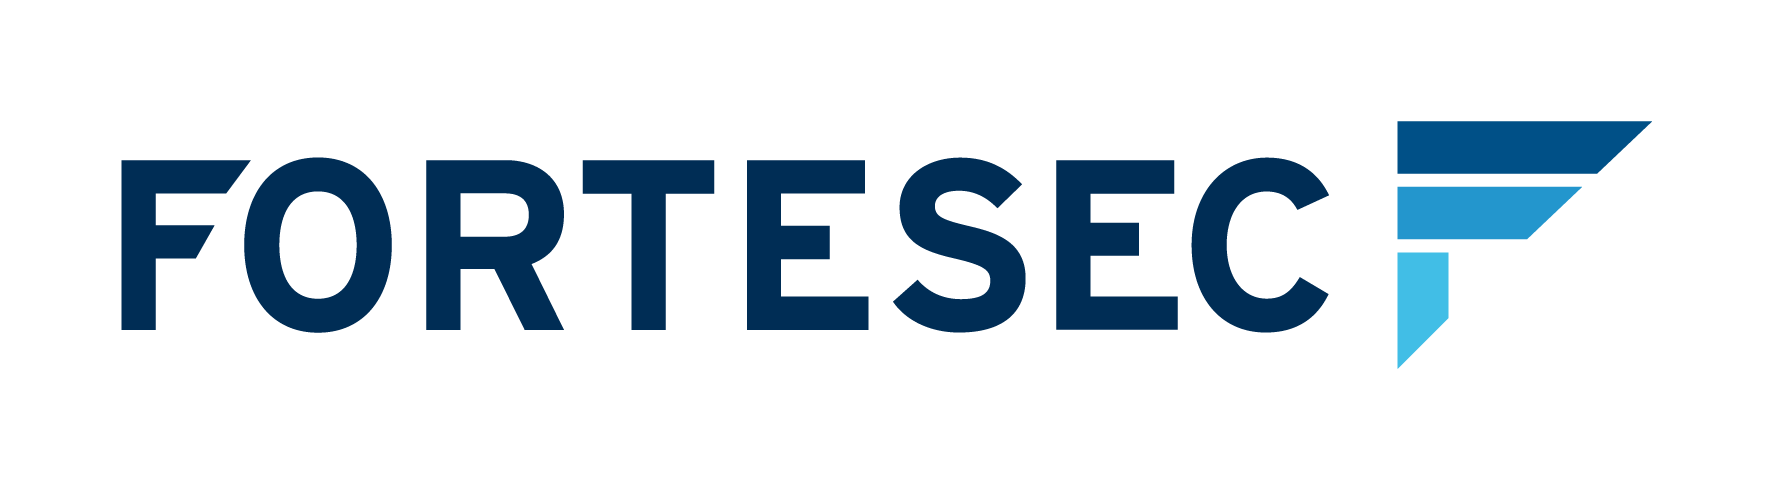 Logo_Empresa_Fortesec